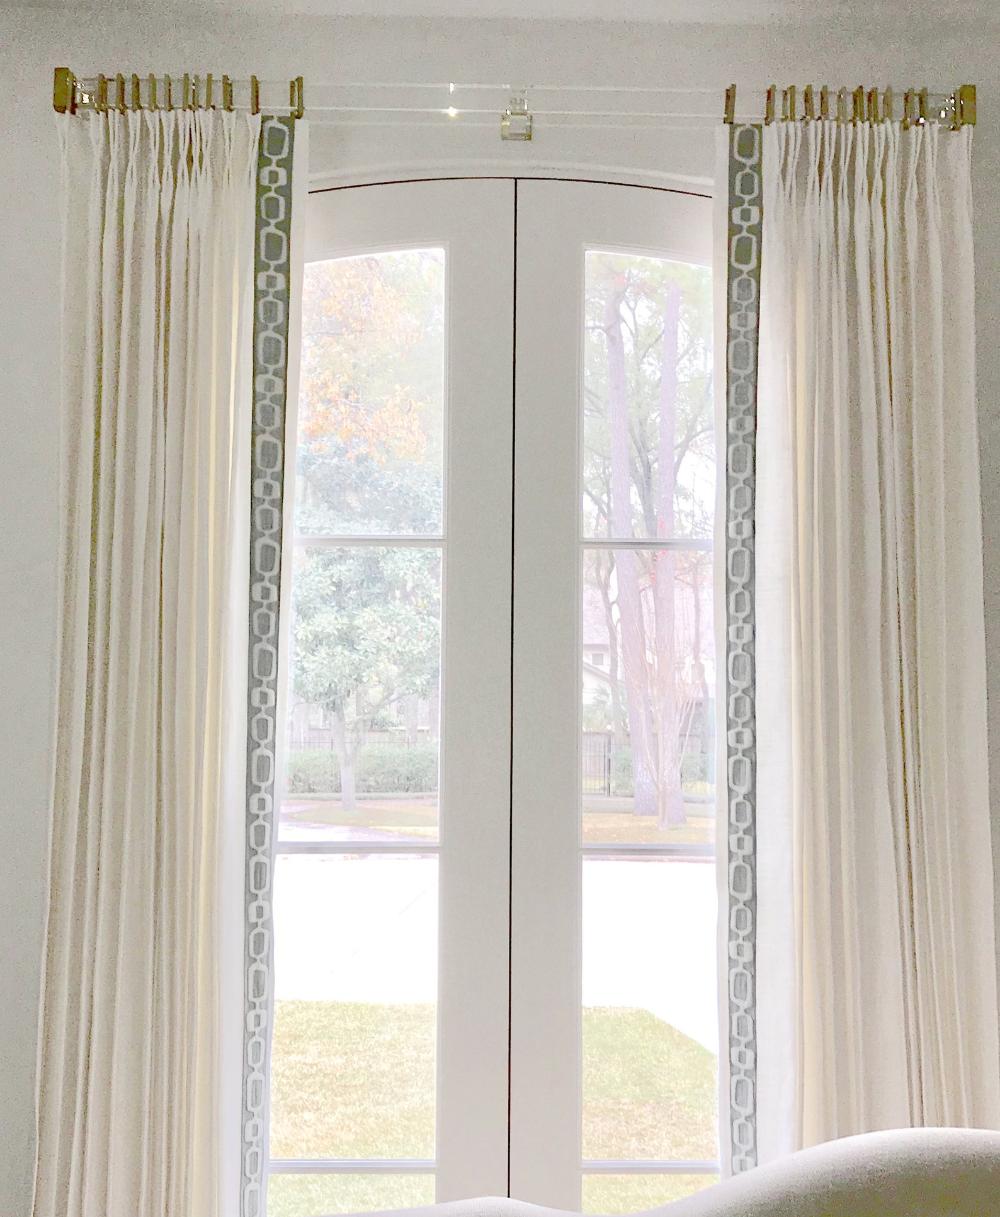 Greek Key Curtains Grey Trim Wide Trimmed Curtains White Linen